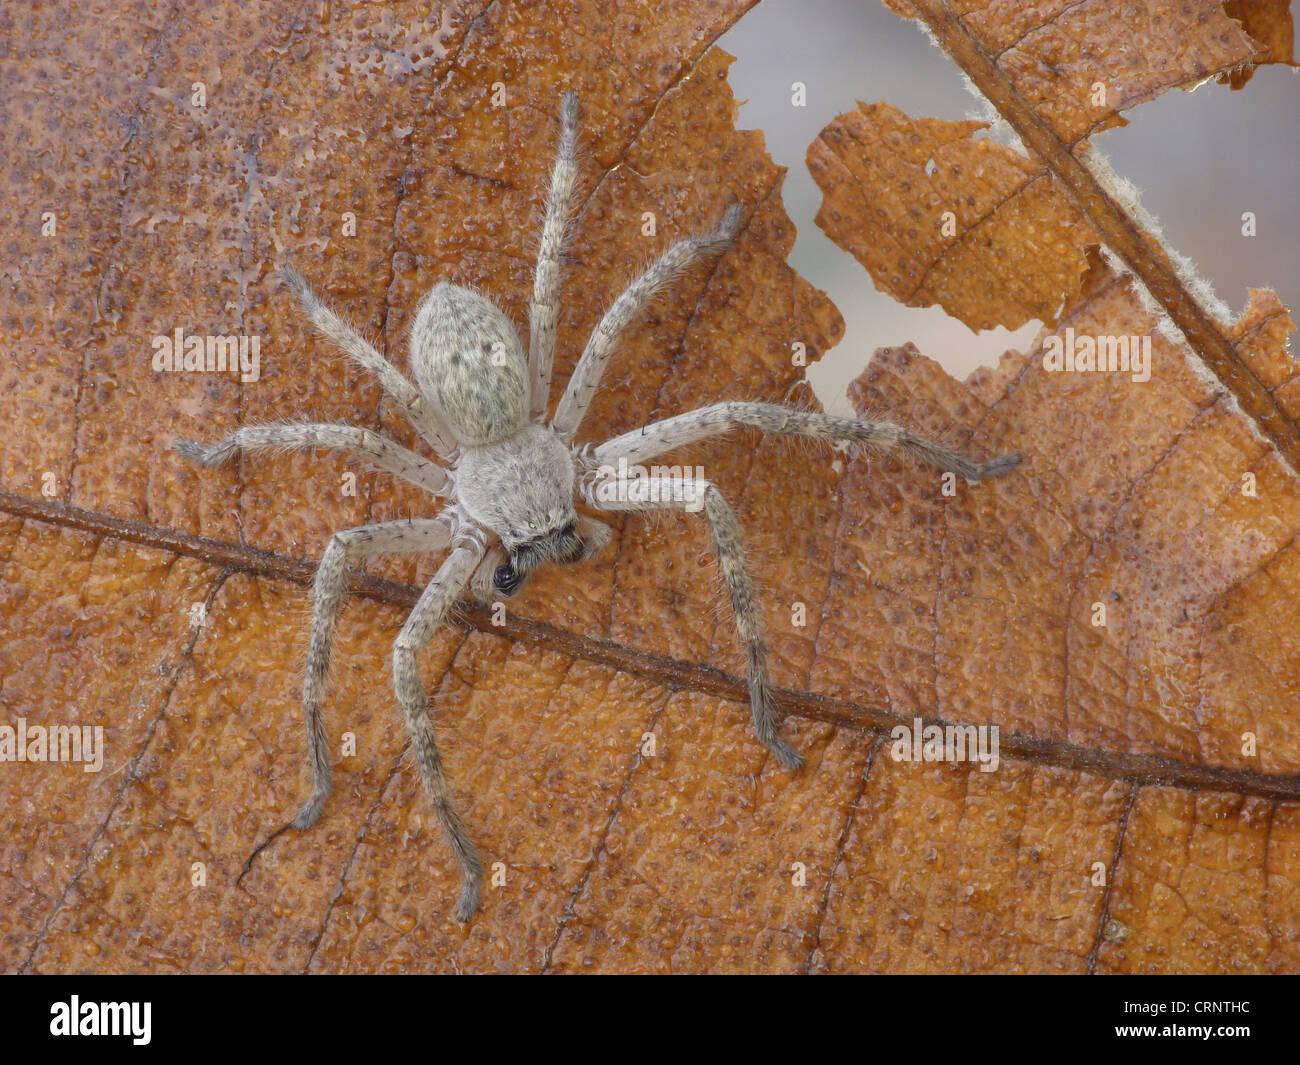 Mountain Huntsman Spider (Isopeda montana) young instar, walking